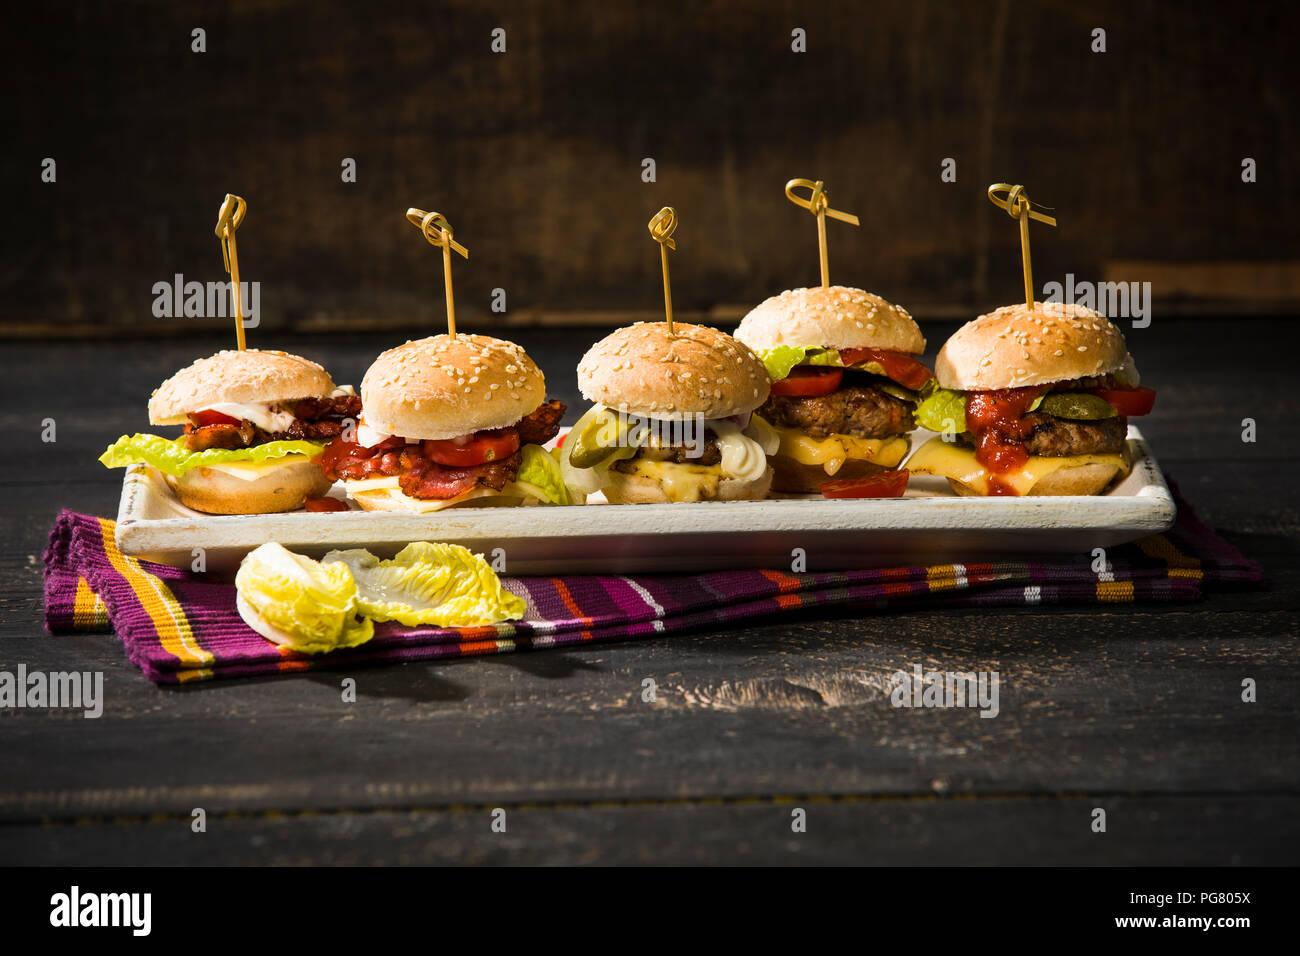 Mini burger on plate - Stock Image